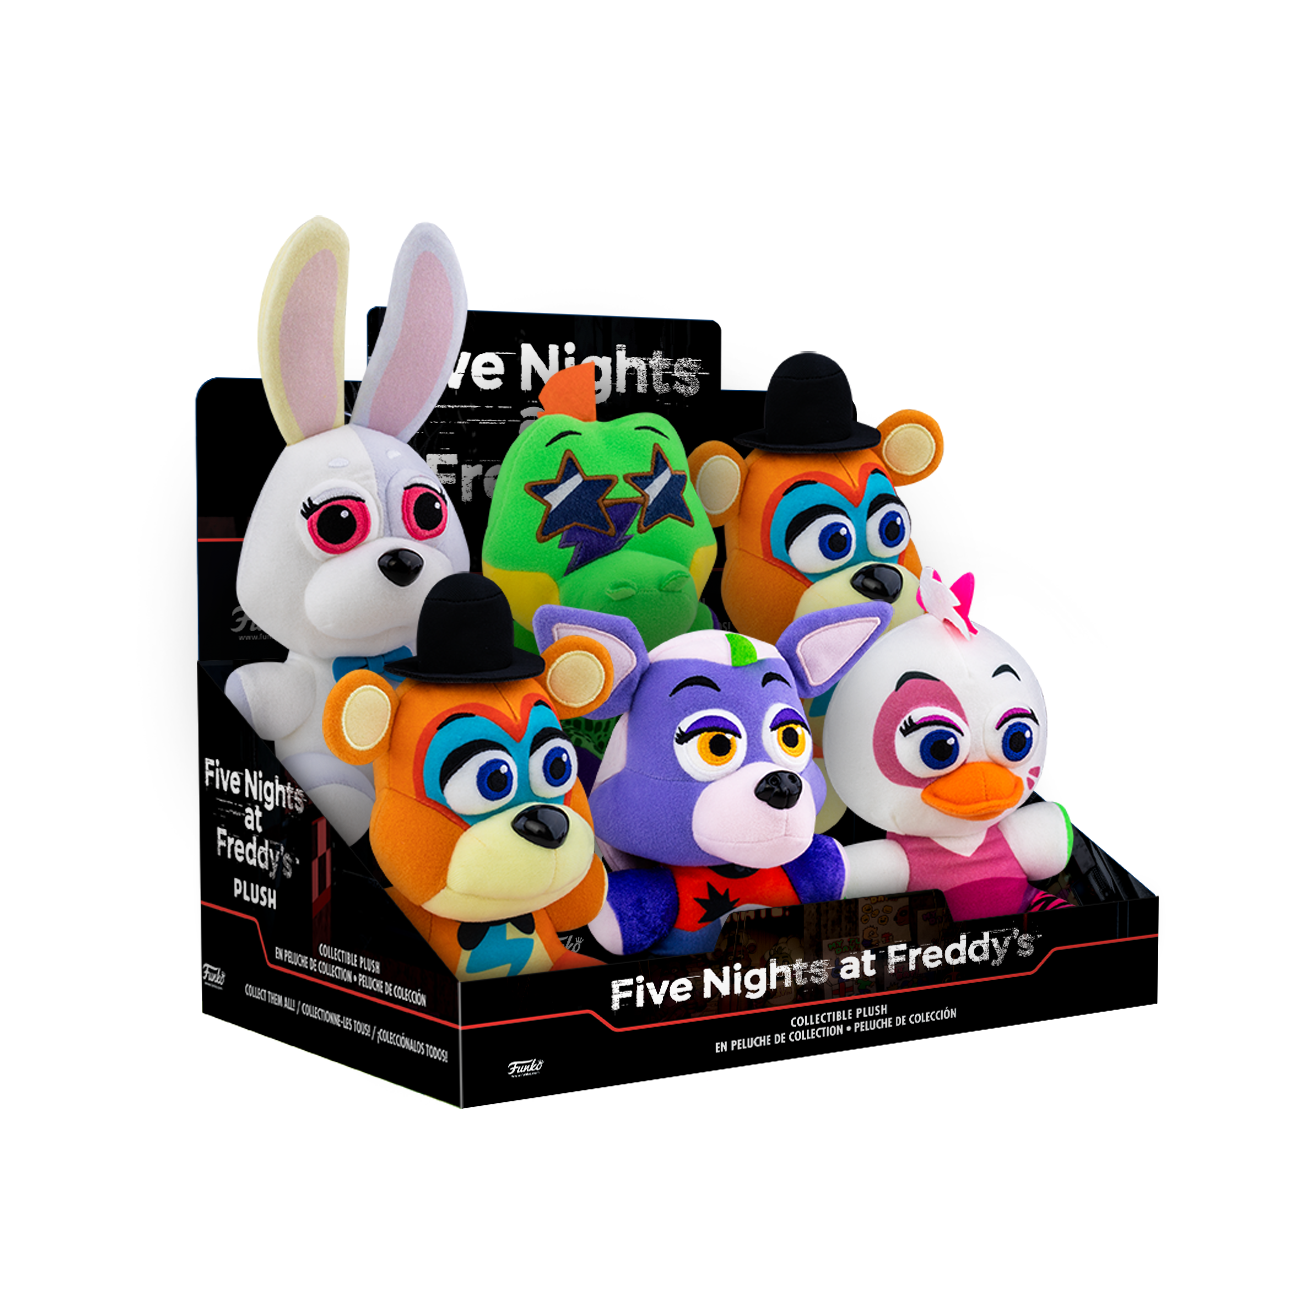 Funko Five Nights at Freddy's: Security Breach Plush